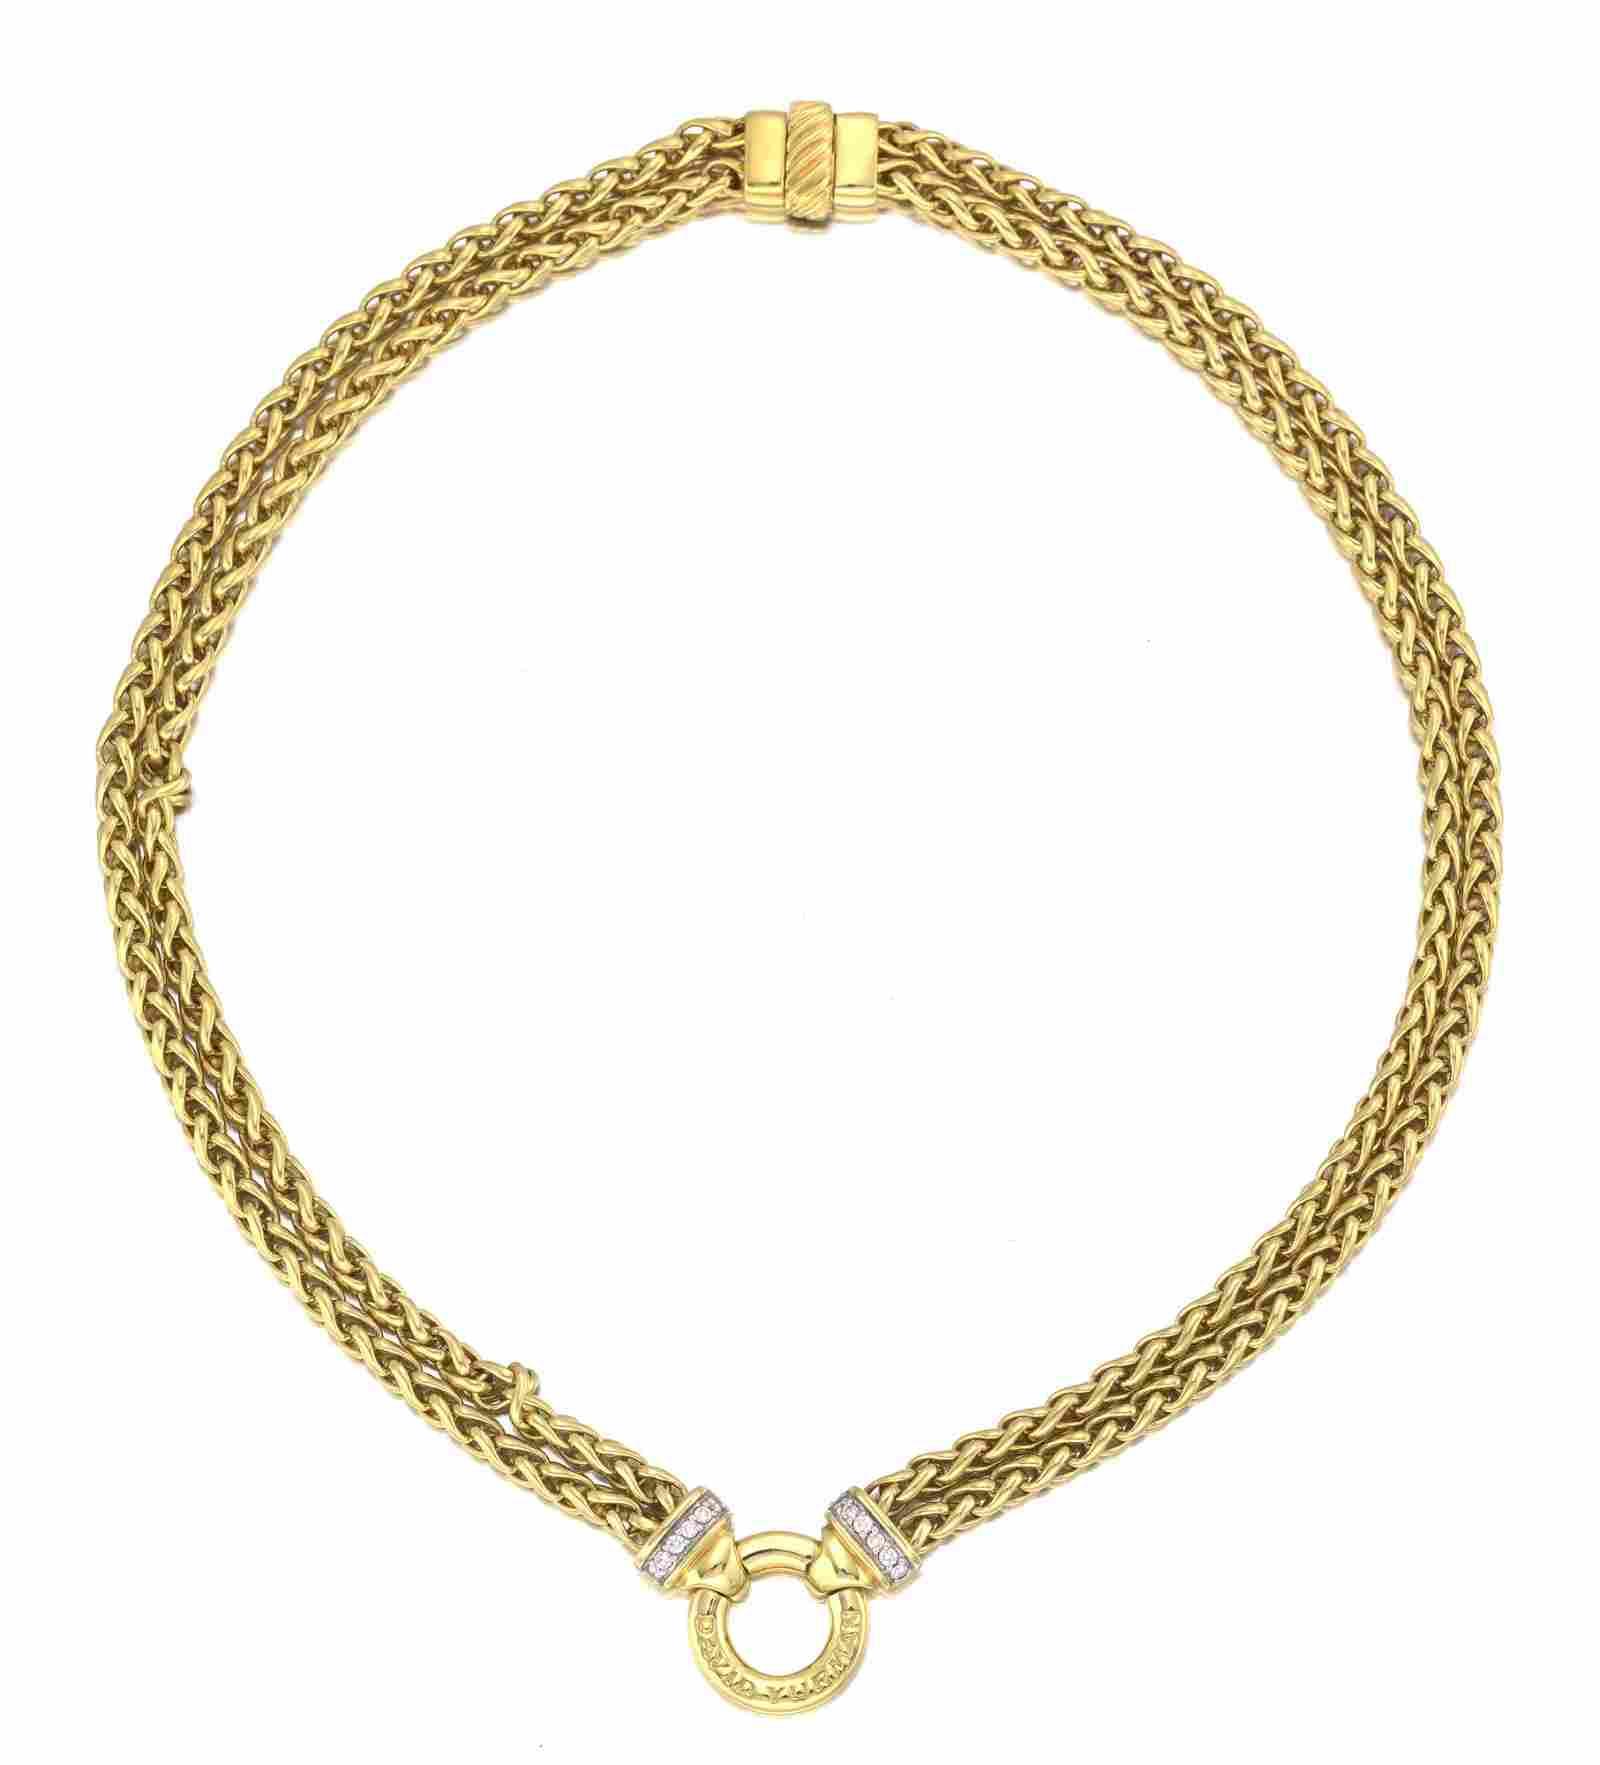 A David Yurman diamond necklace